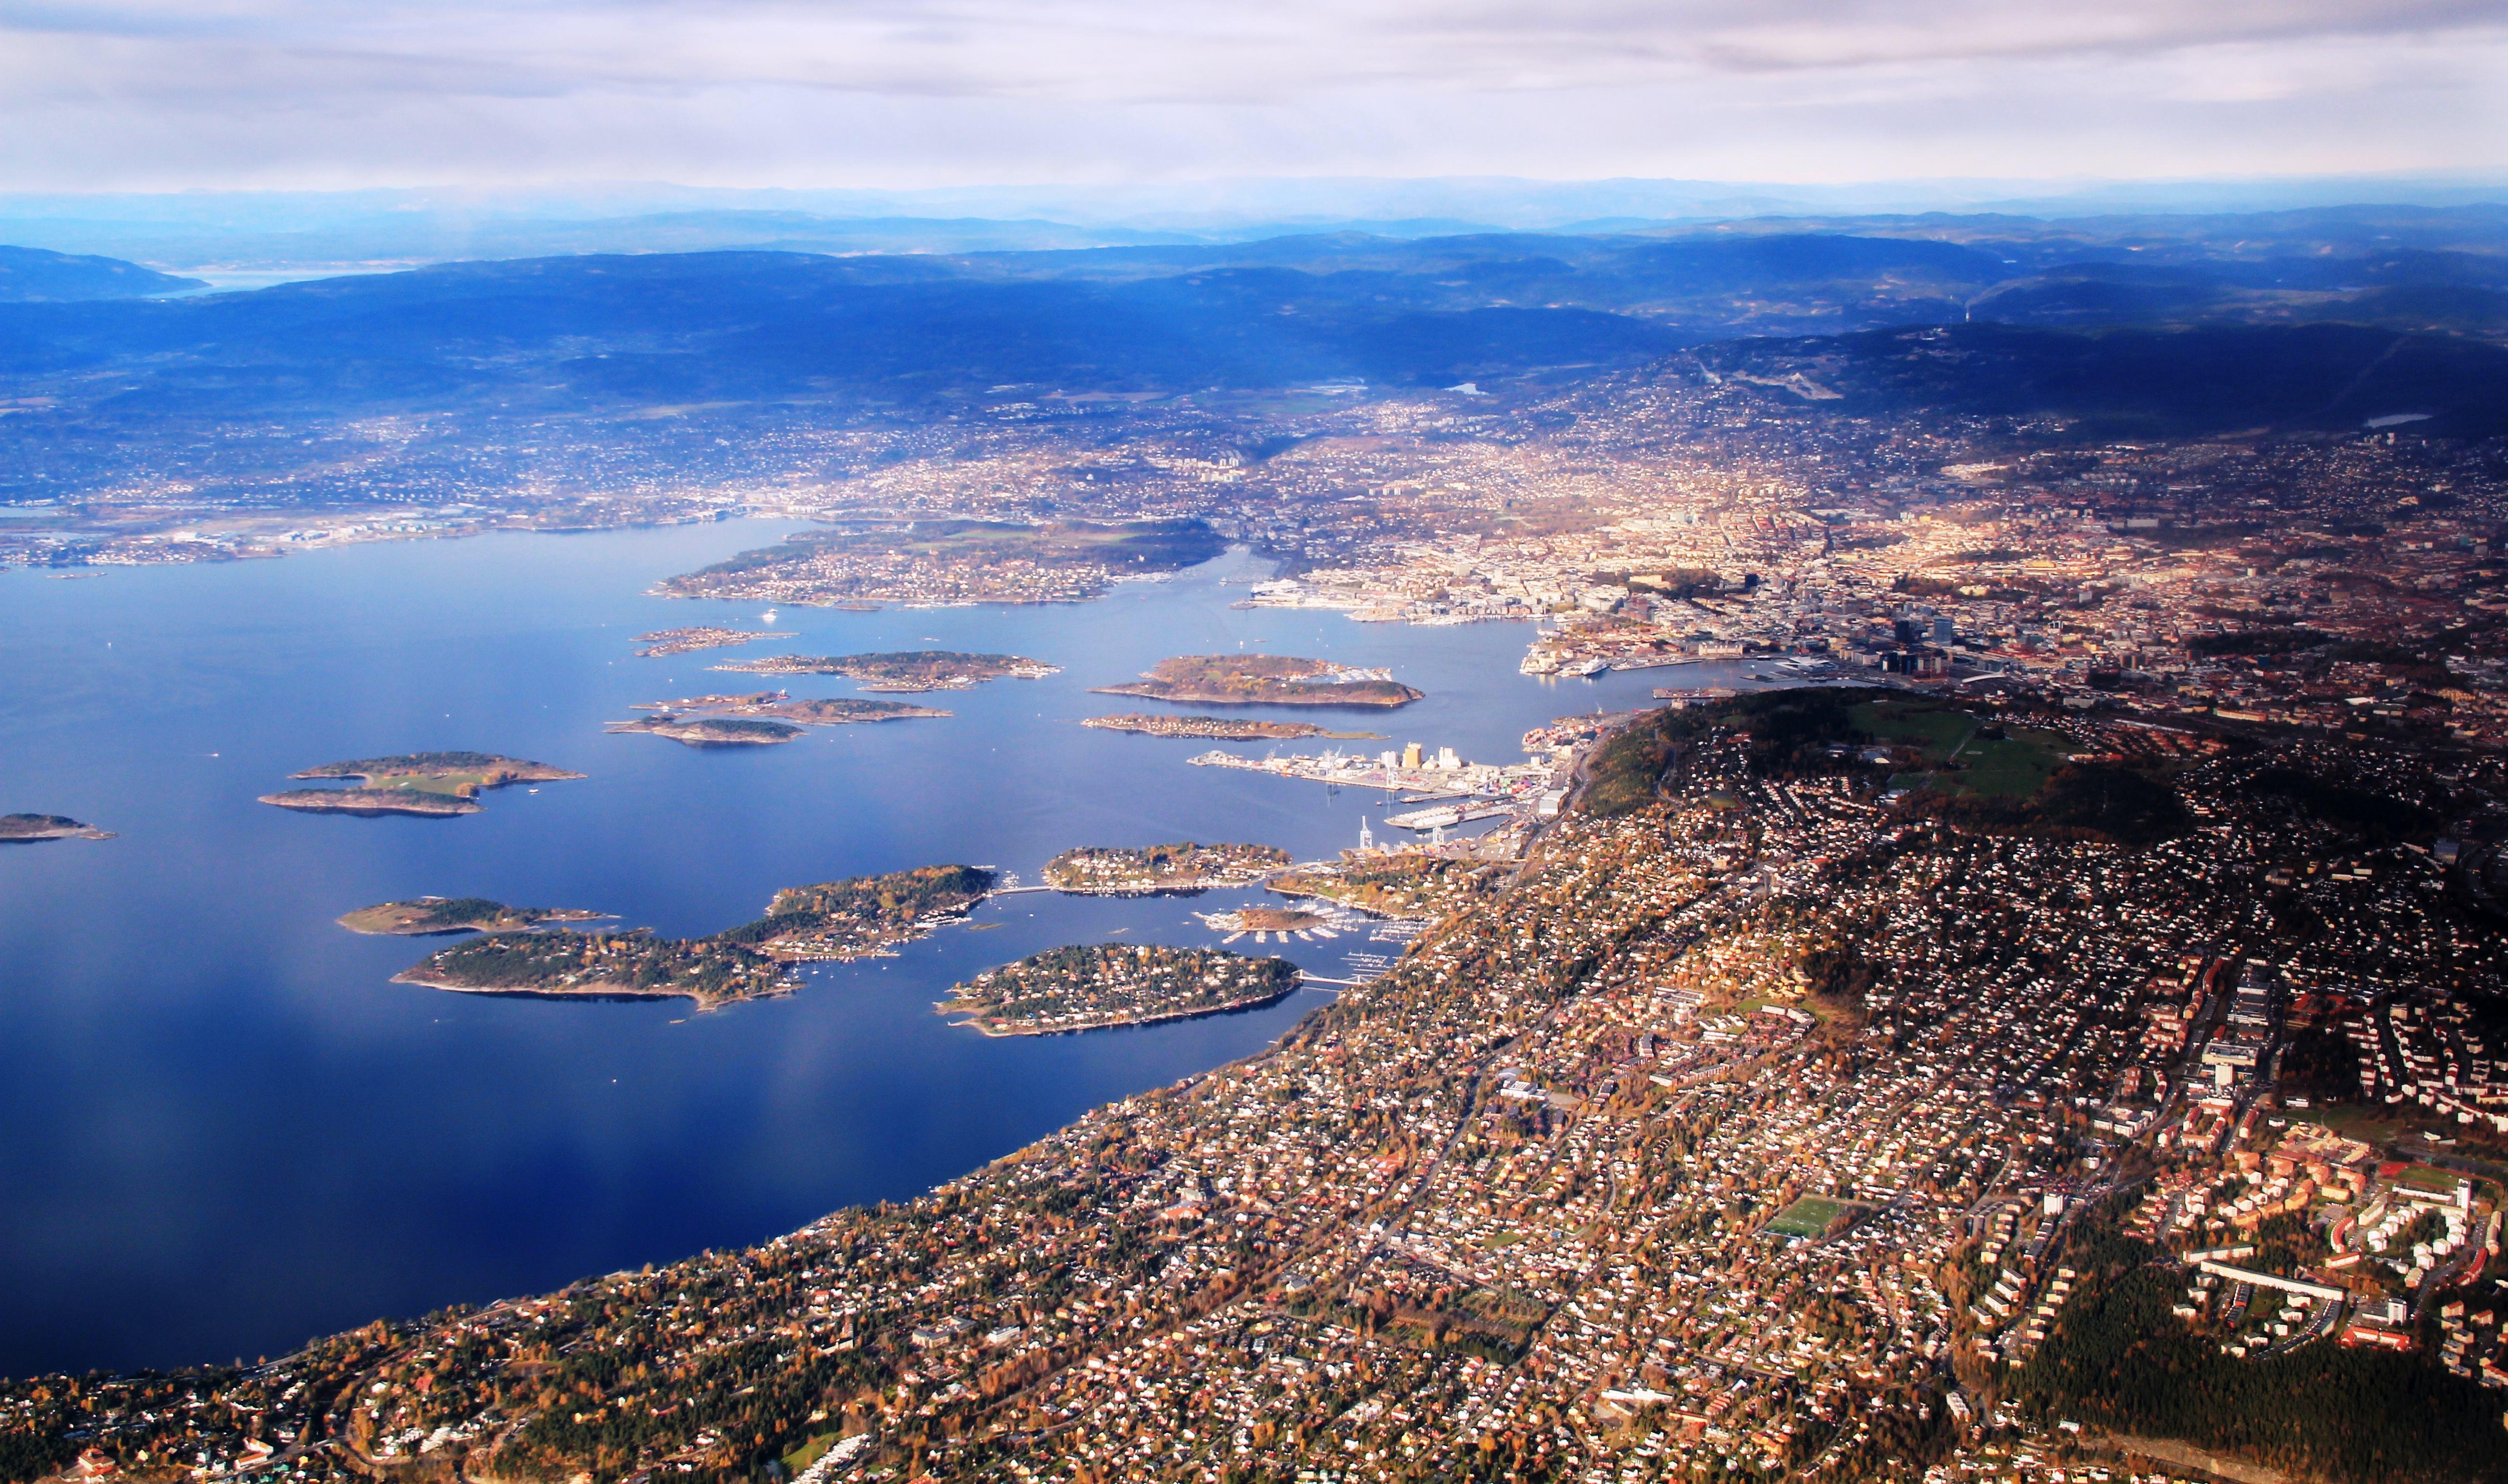 Oslo | fot. Chell Hill | lic. CC-BY-3.0